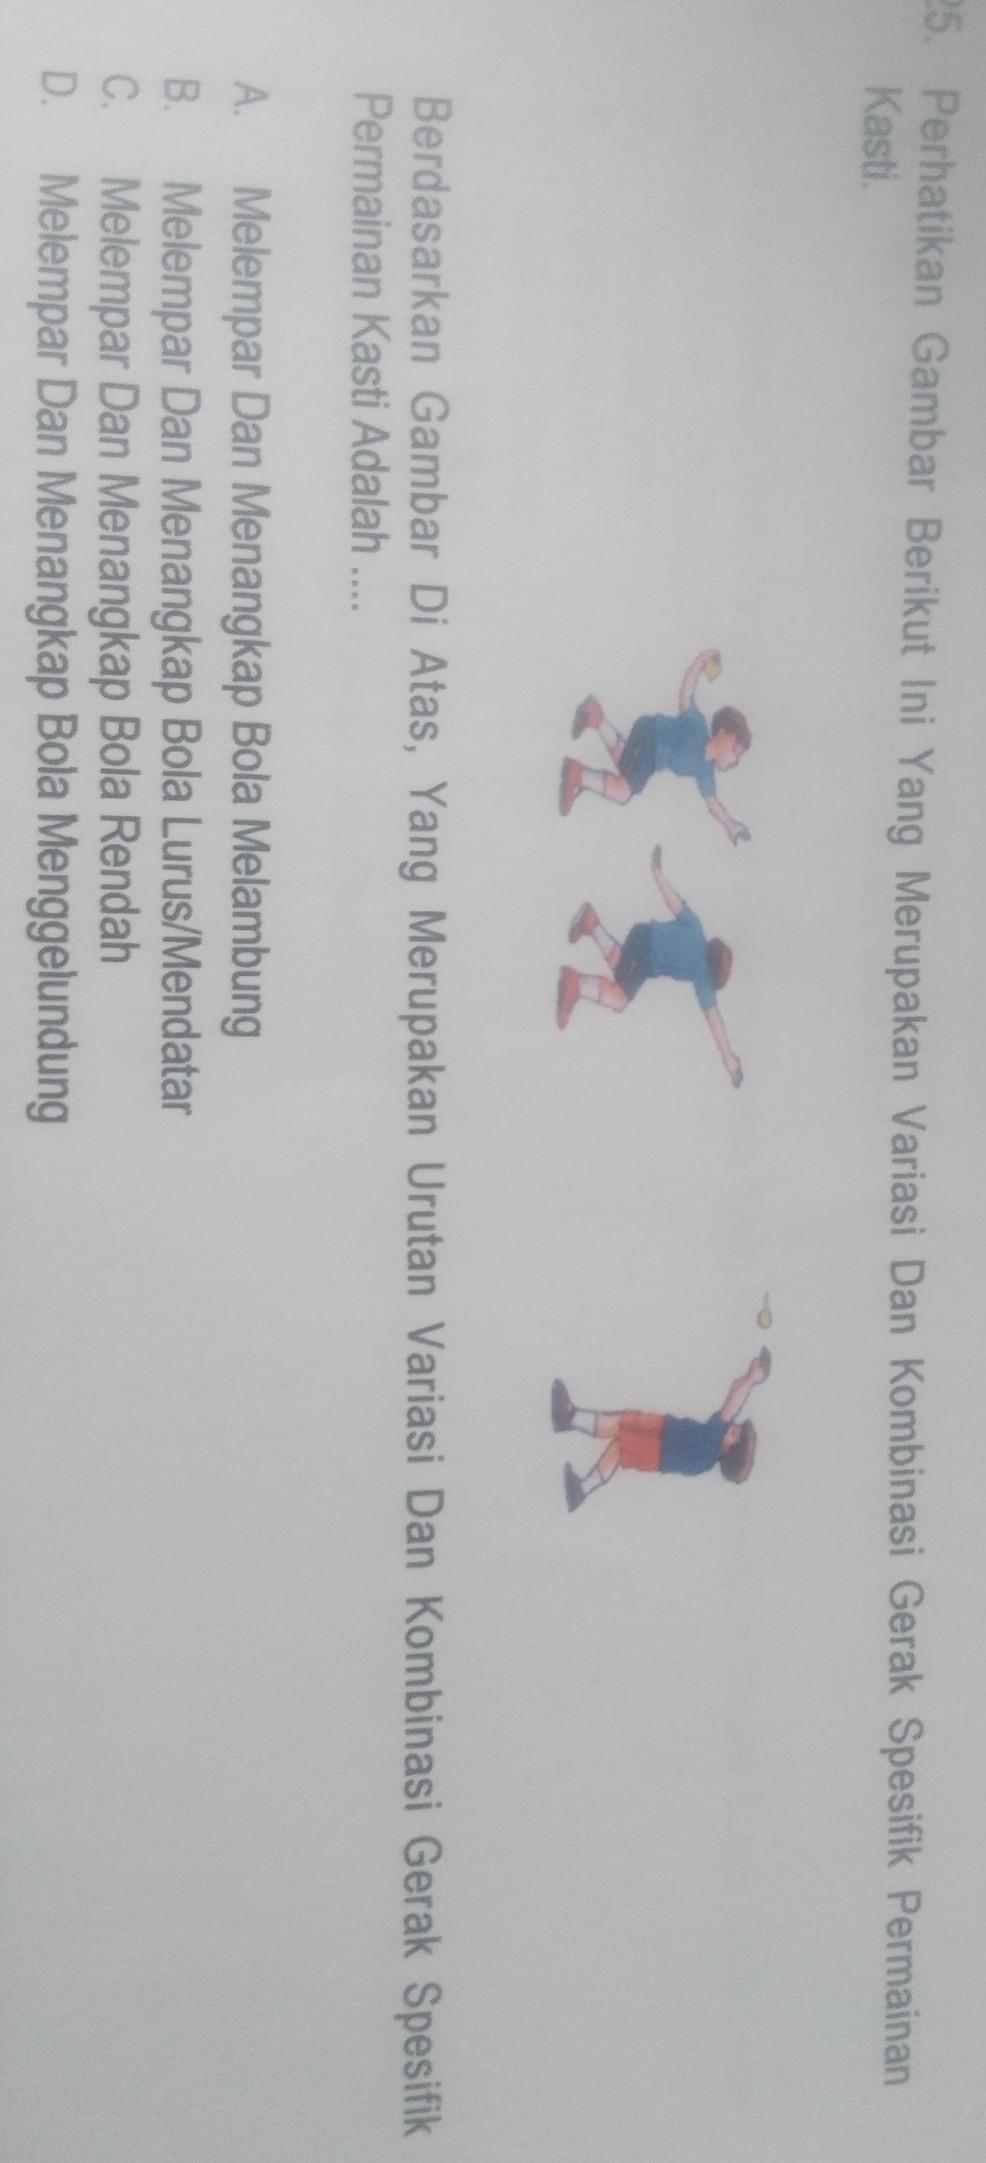 Di Bawah Ini Merupakan Gerak Spesifik Permainan Sepak Bola Kecuali : bawah, merupakan, gerak, spesifik, permainan, sepak, kecuali, Berdasarkan, Gambar, Atas,, Merupakan, Urutan, Variasi, Kombinasi, Gerak, Spesifik, Permainan, Brainly.co.id